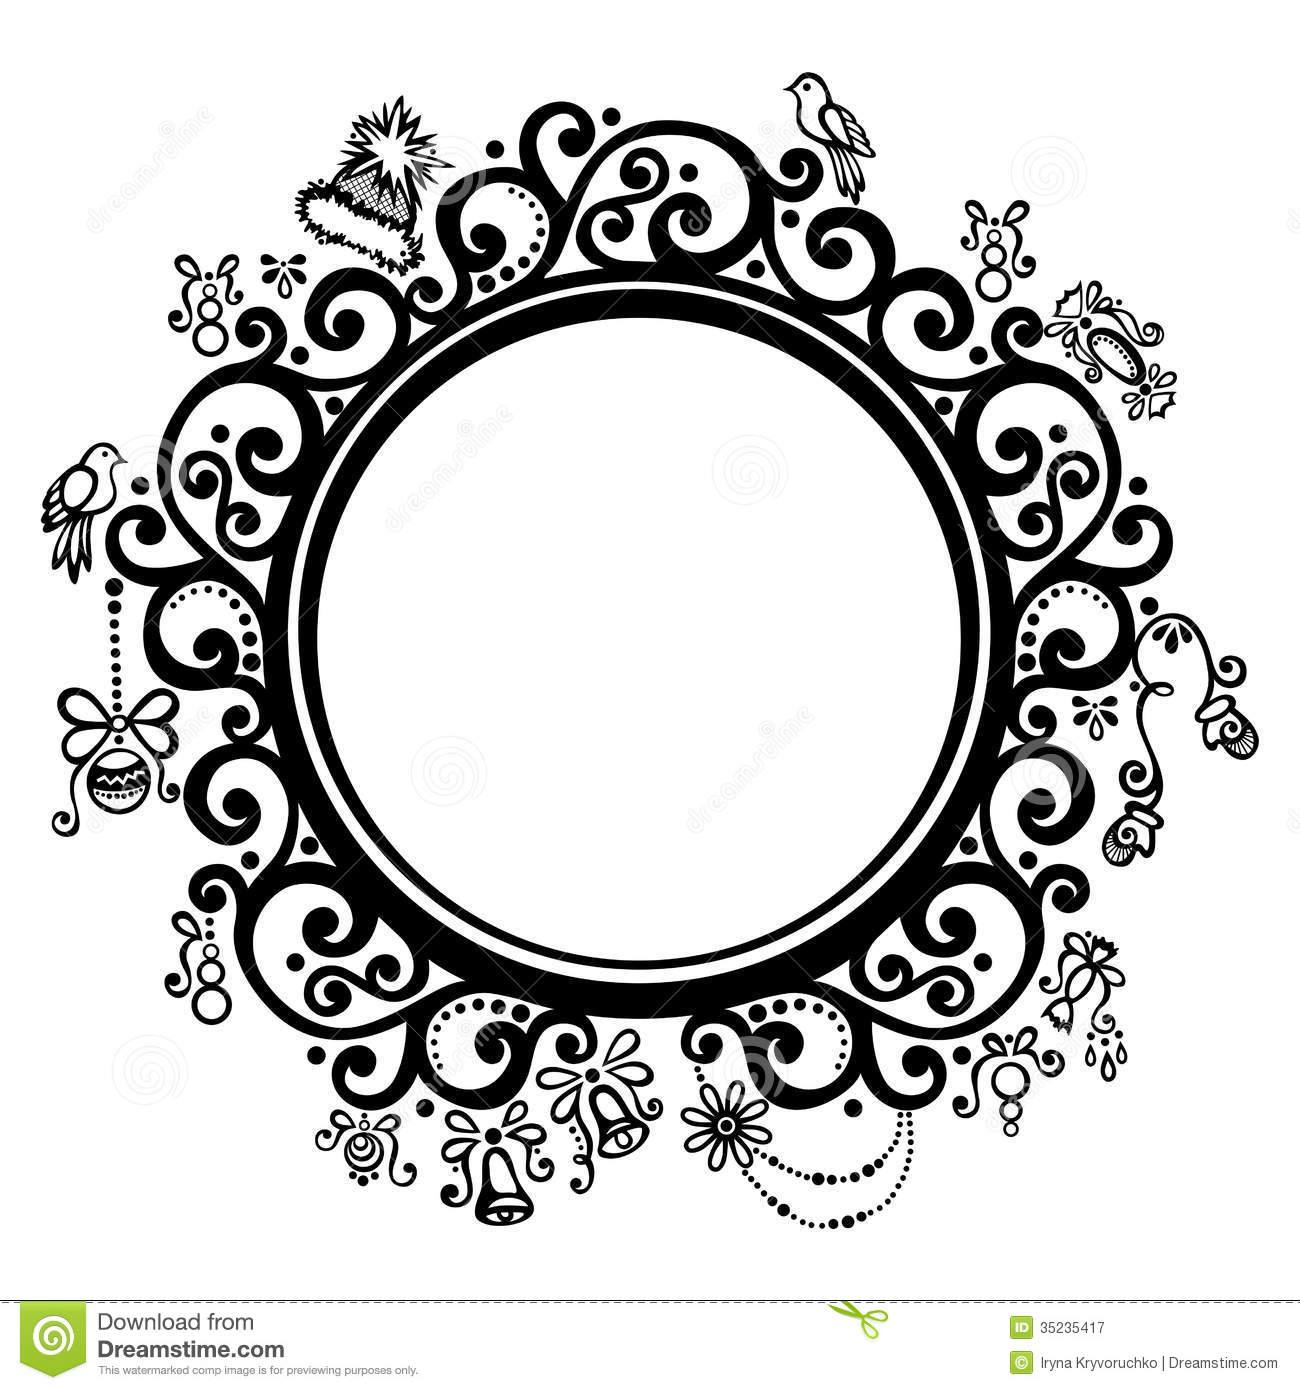 7 round decorative frame vector images floral decorative